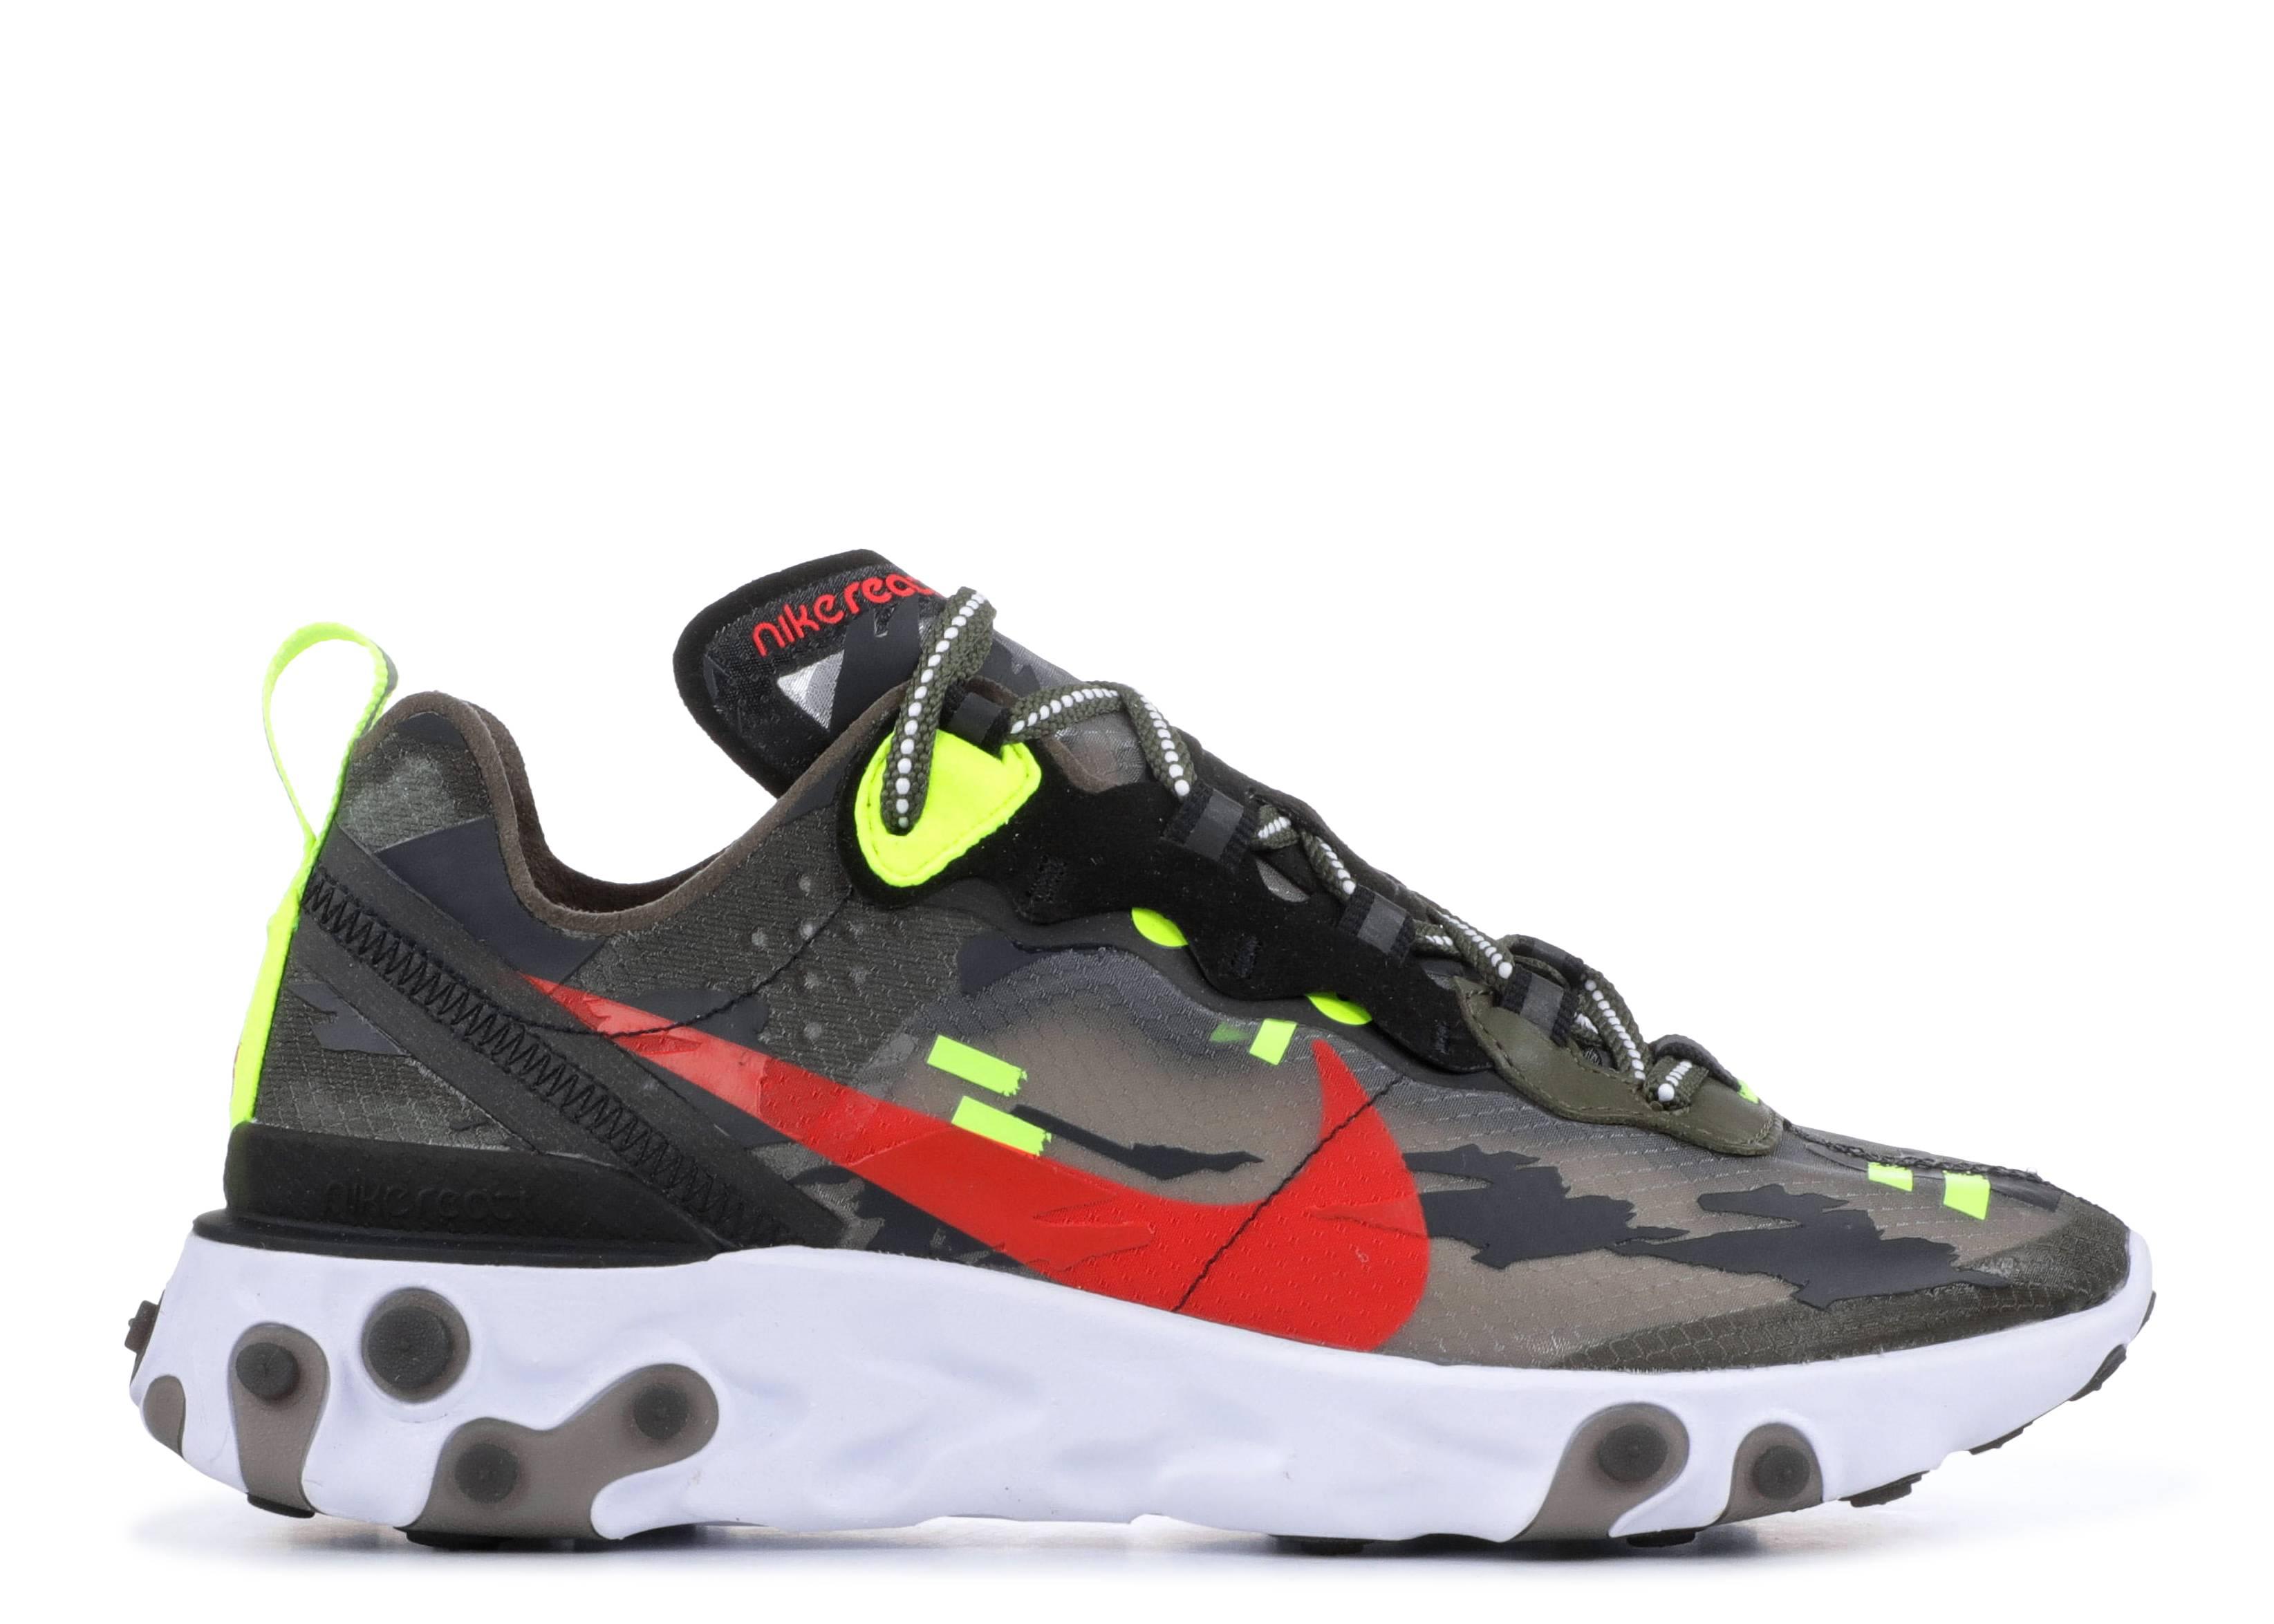 Nike React Element 87 Medium Olive Bright Crimson Black Volt CJ4988 200